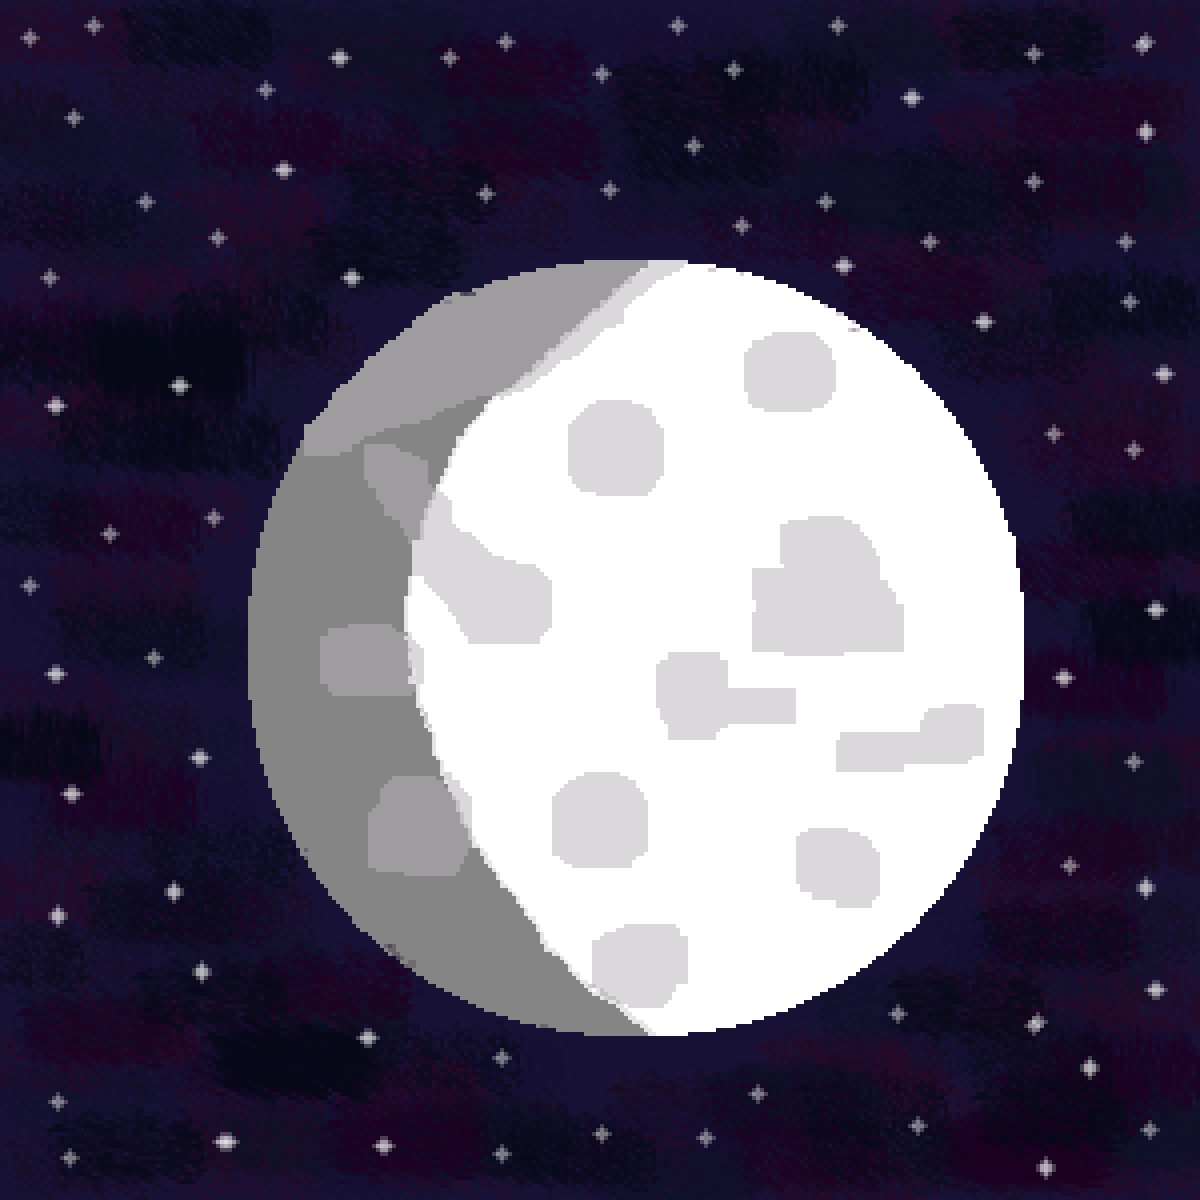 Moon by Minda219